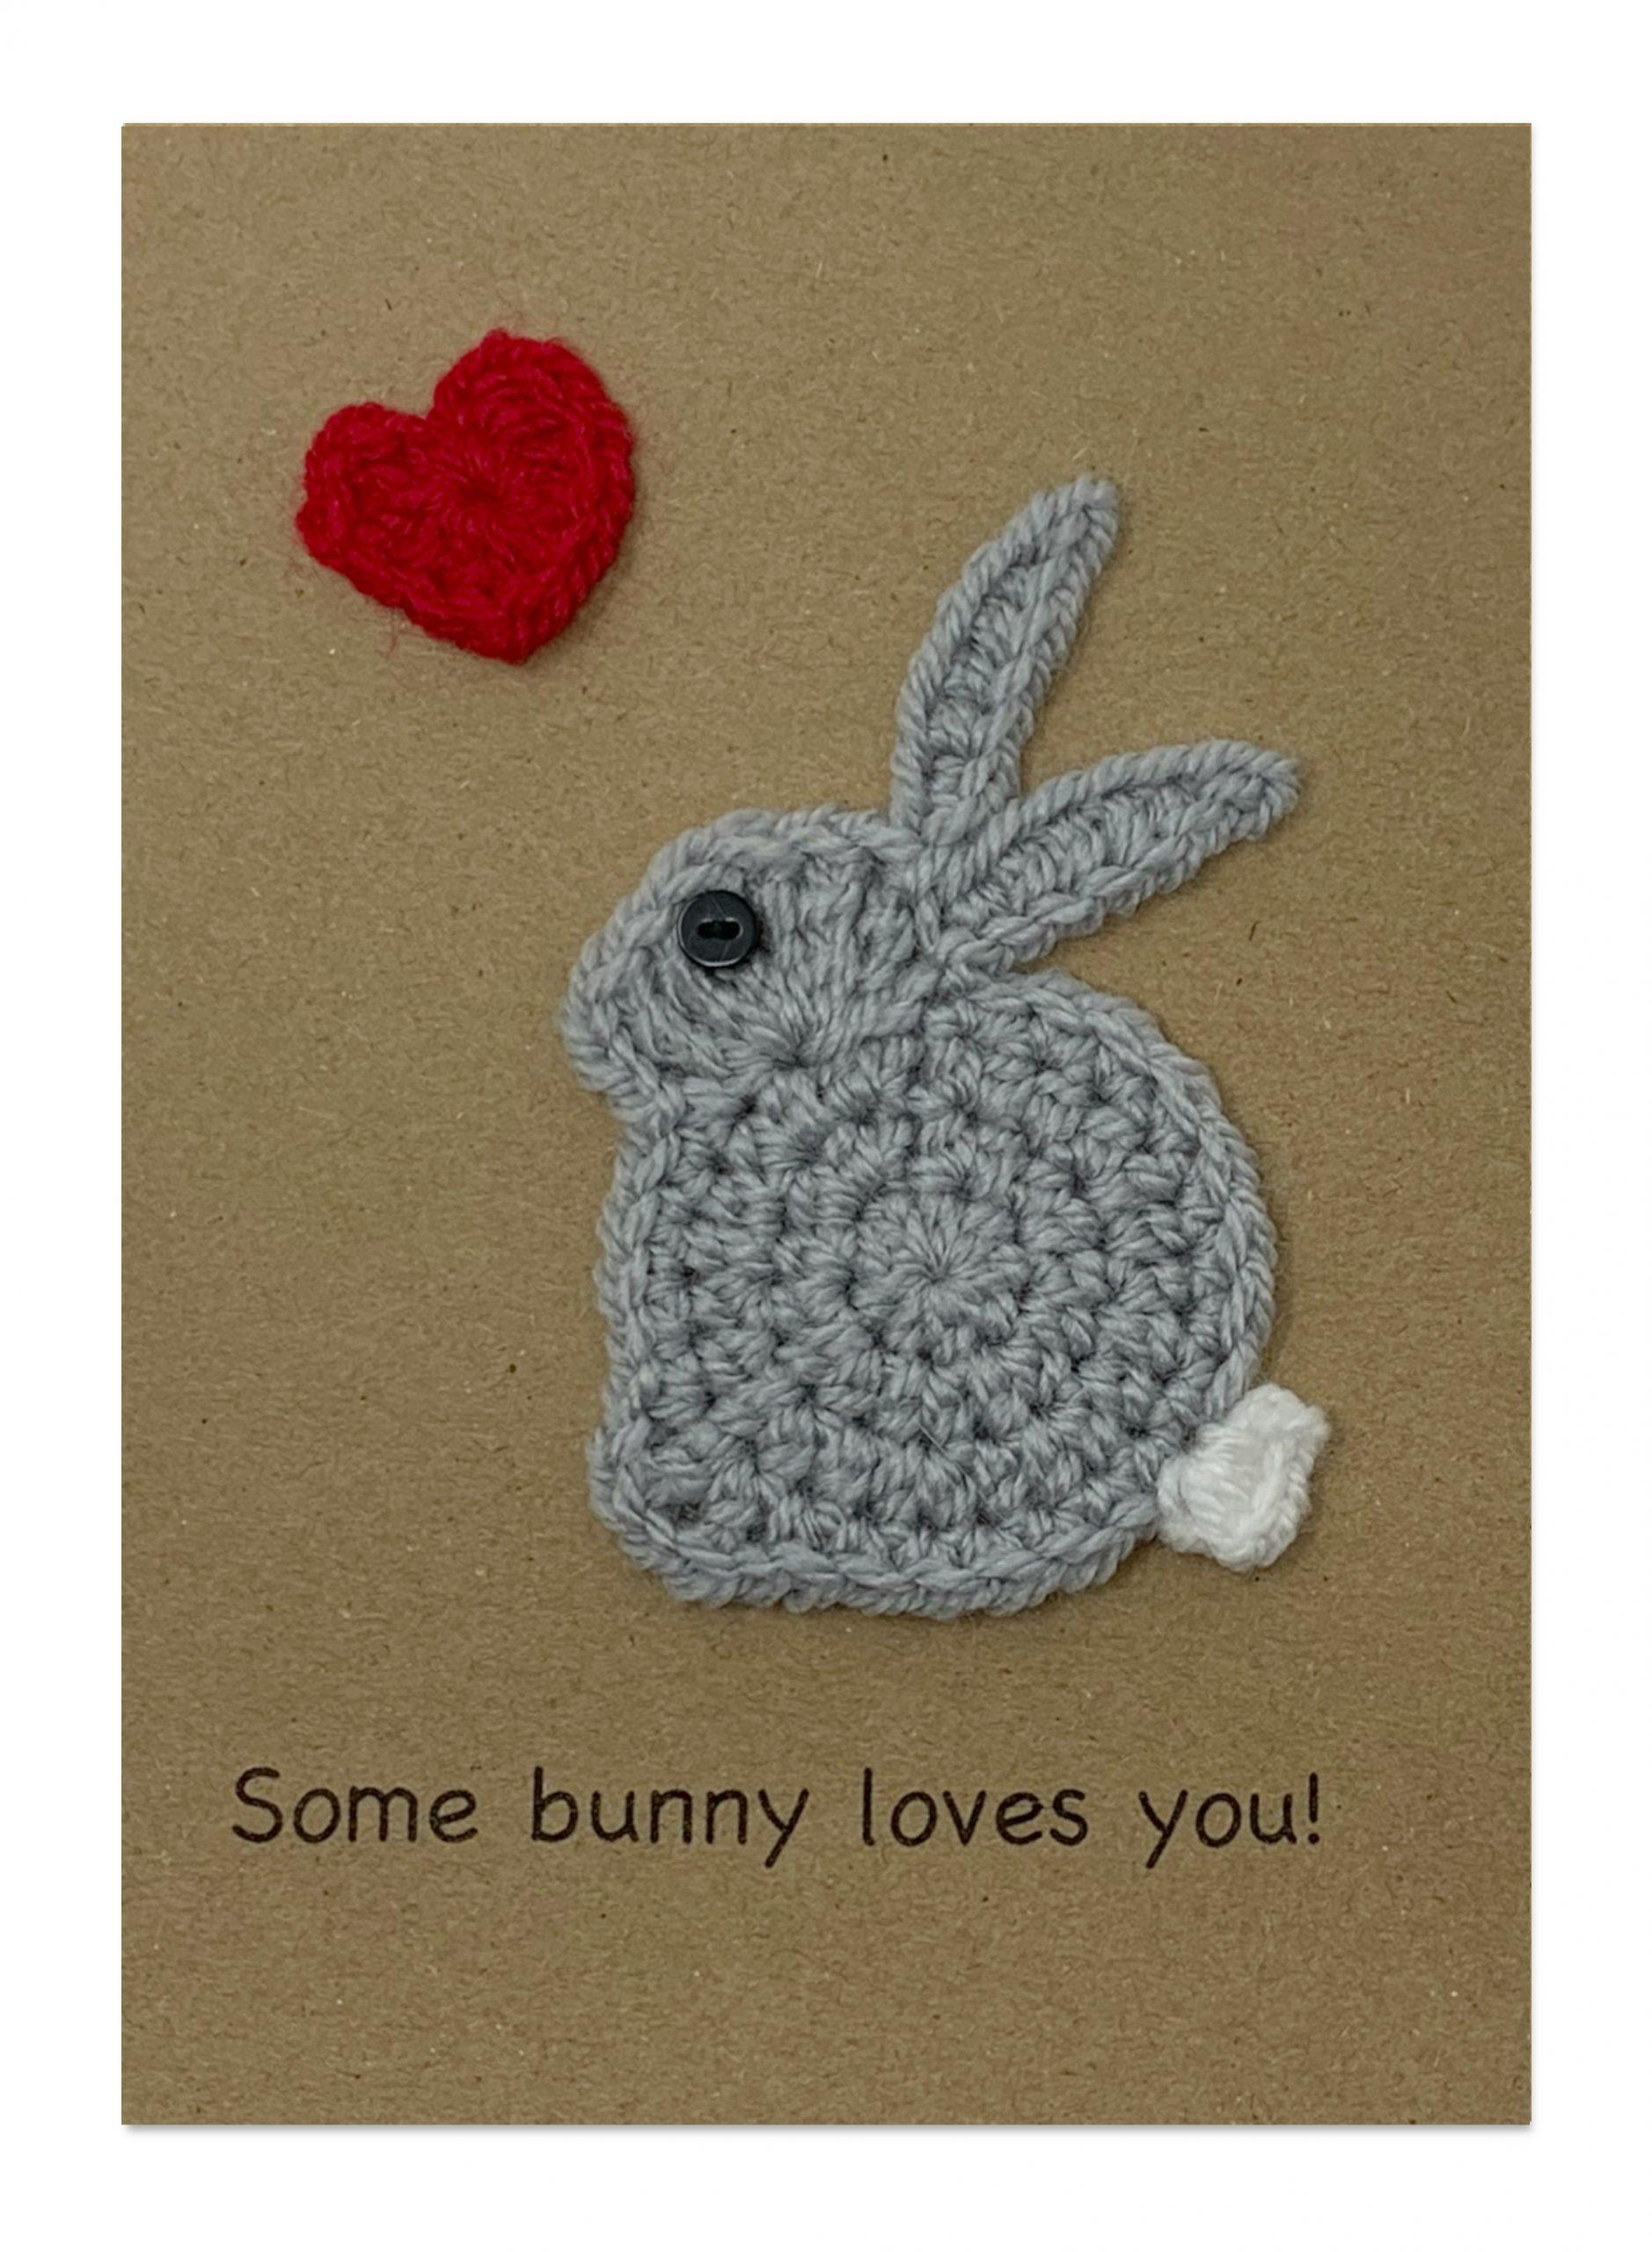 Bunny - edited